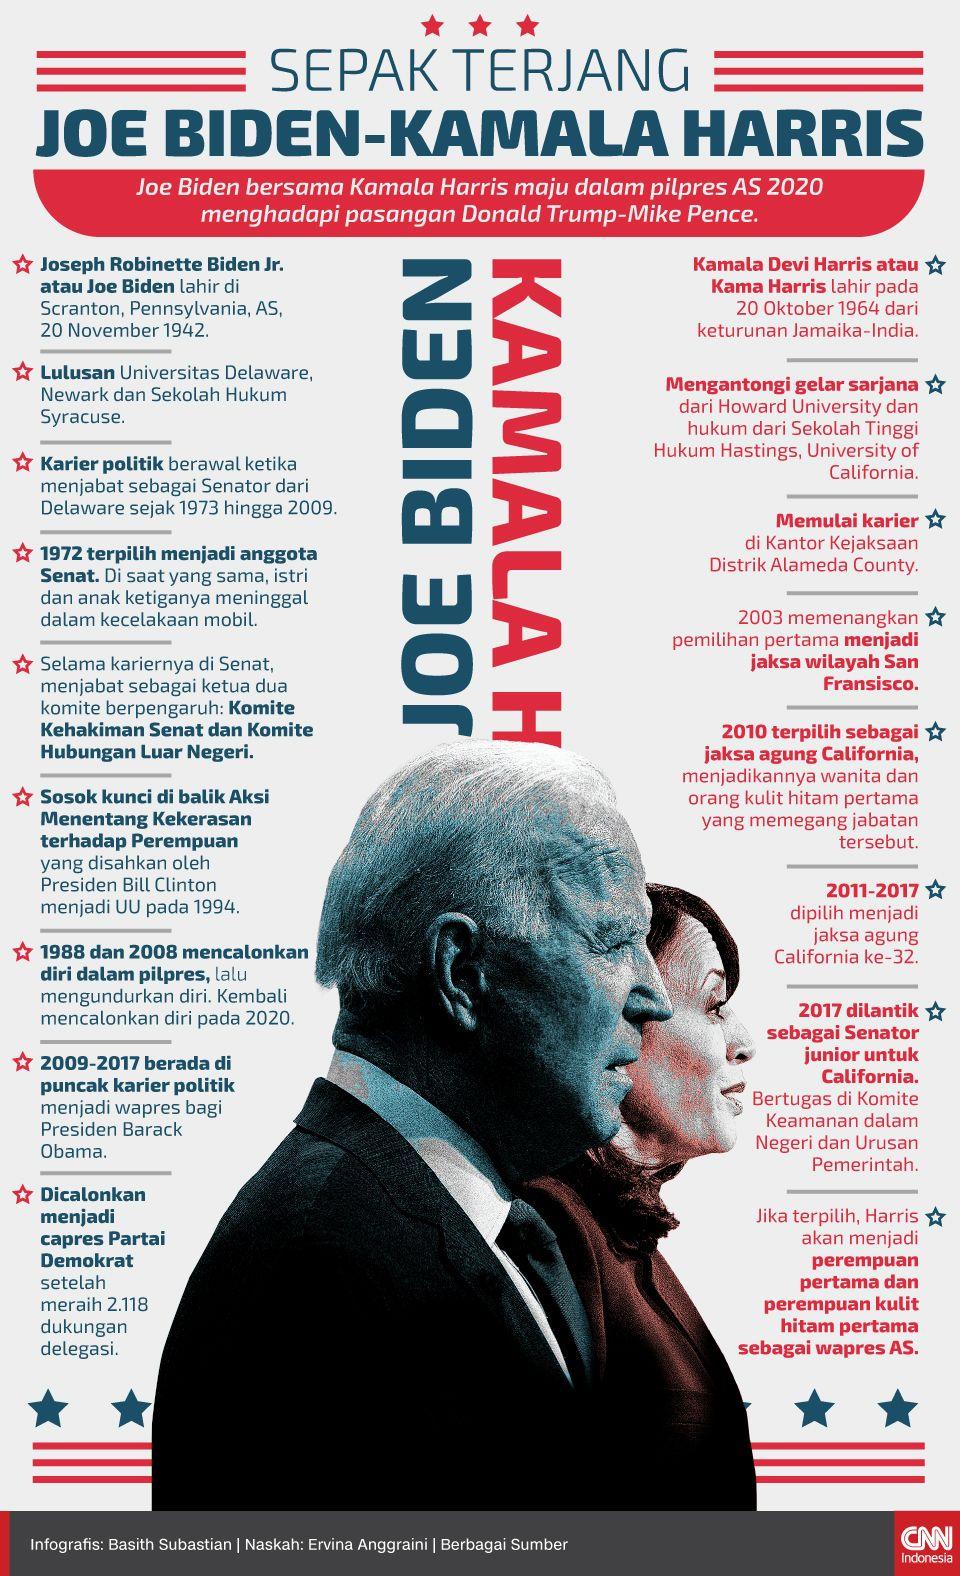 Infografis Sepak Terjang Joe Biden-Kamala Harris